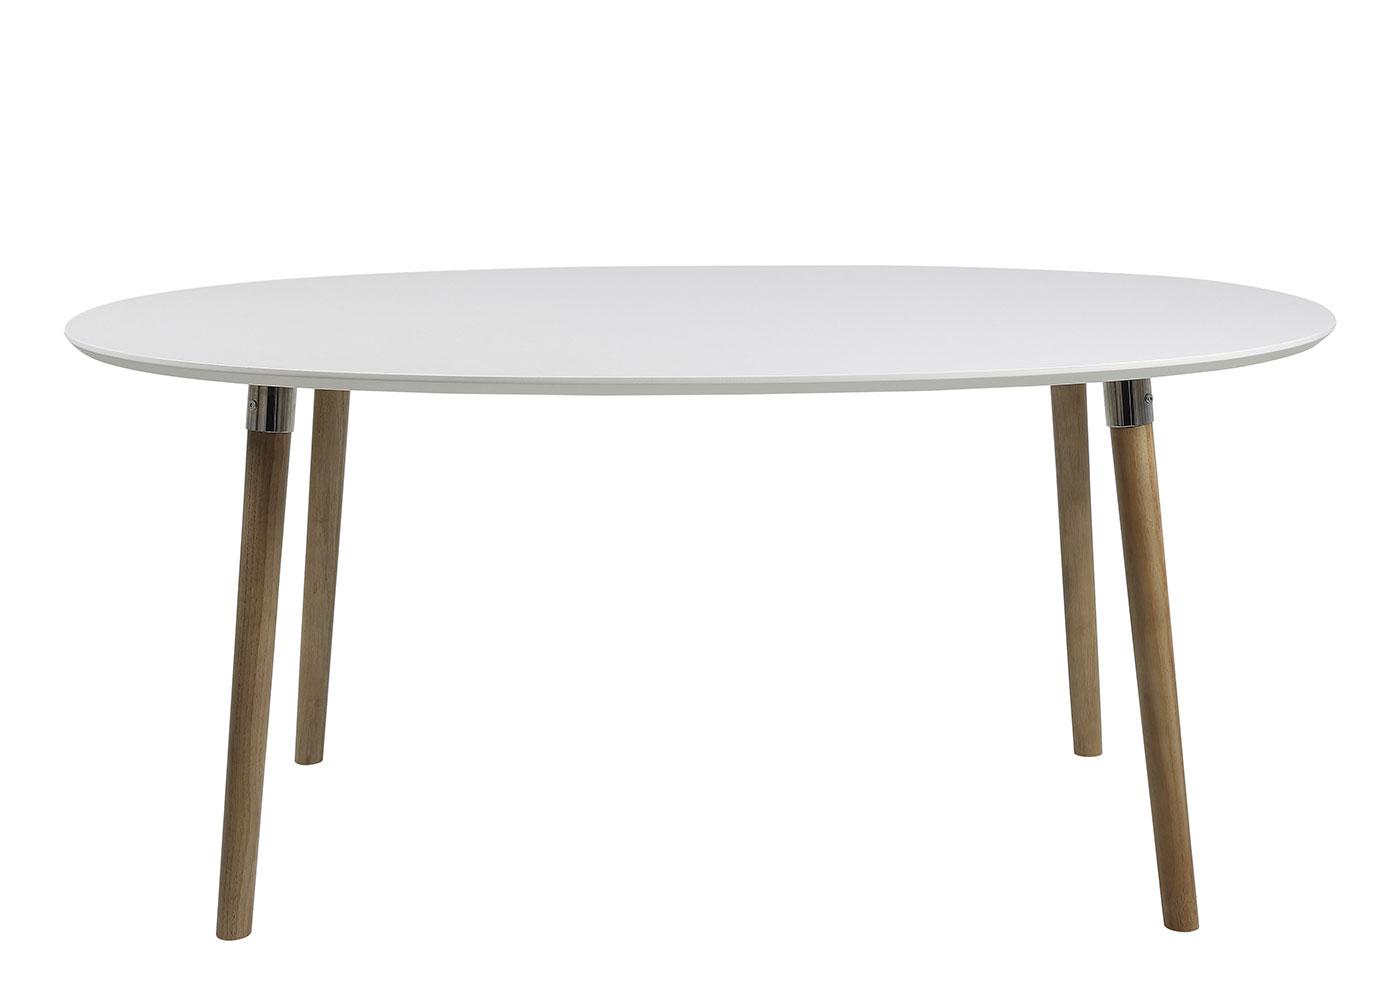 Jedálenský stôl Ballet, 170 cm, biela / dub